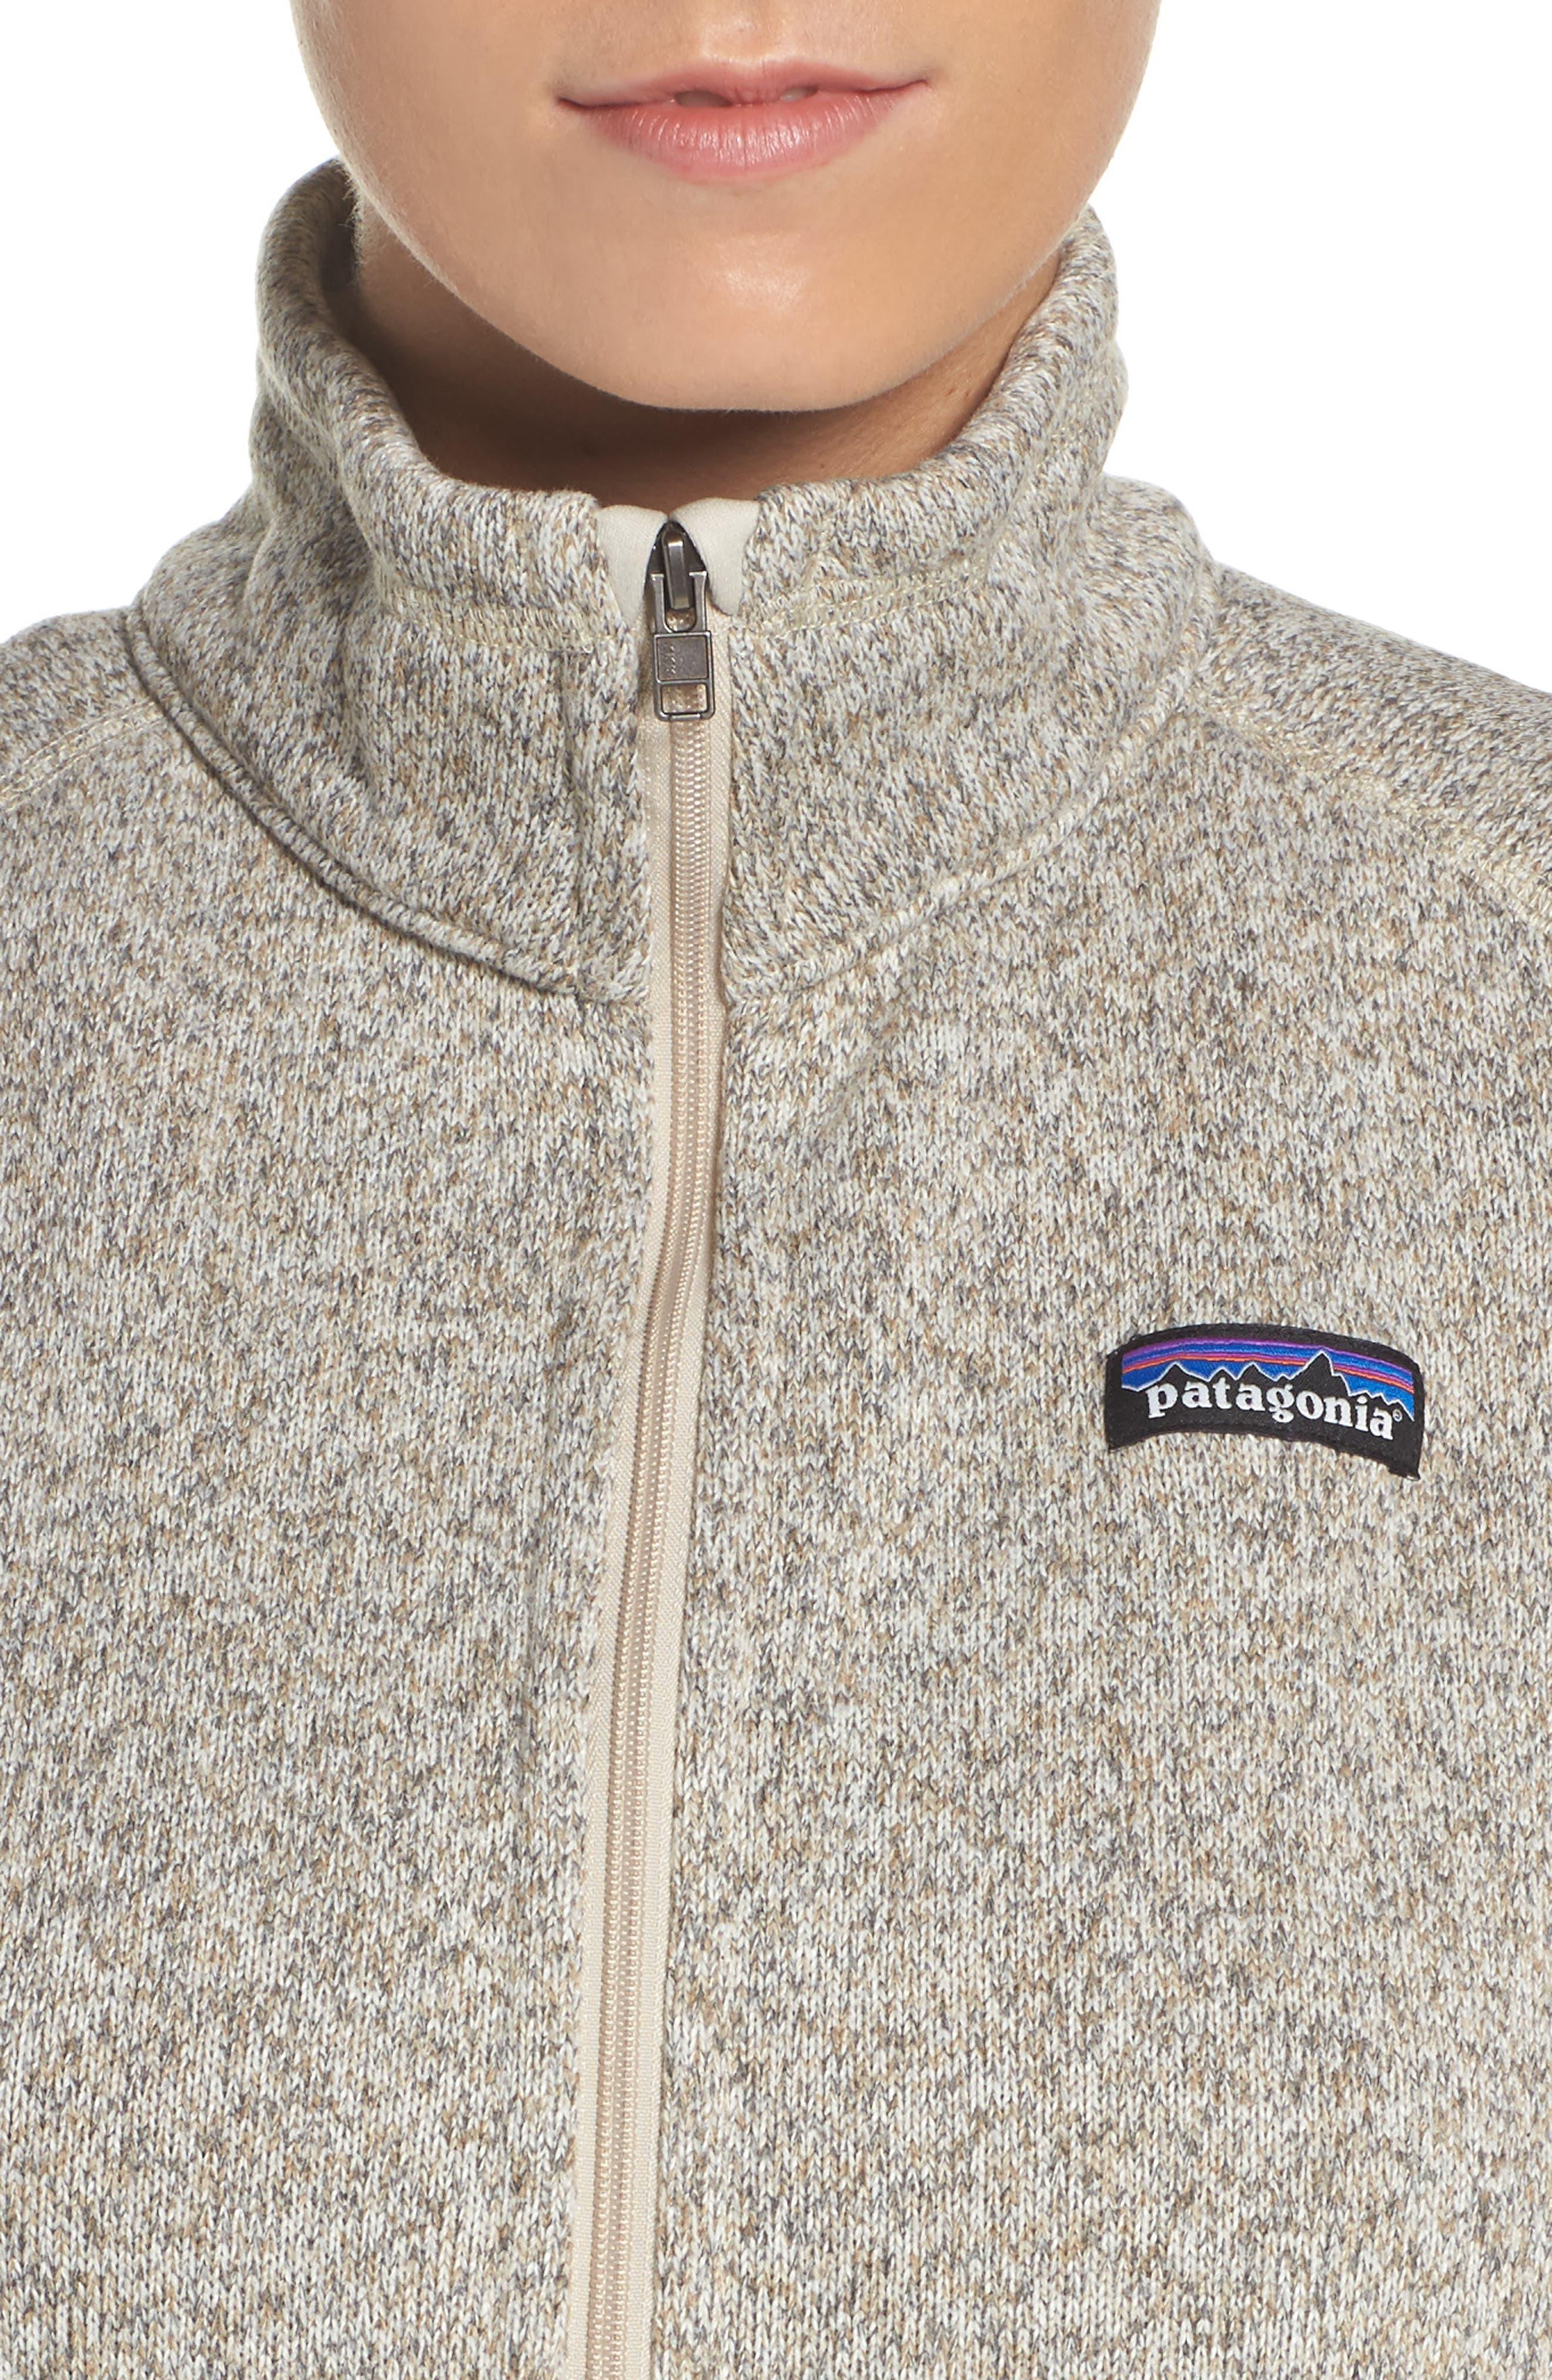 Better Sweater Vest,                             Alternate thumbnail 4, color,                             PELICAN